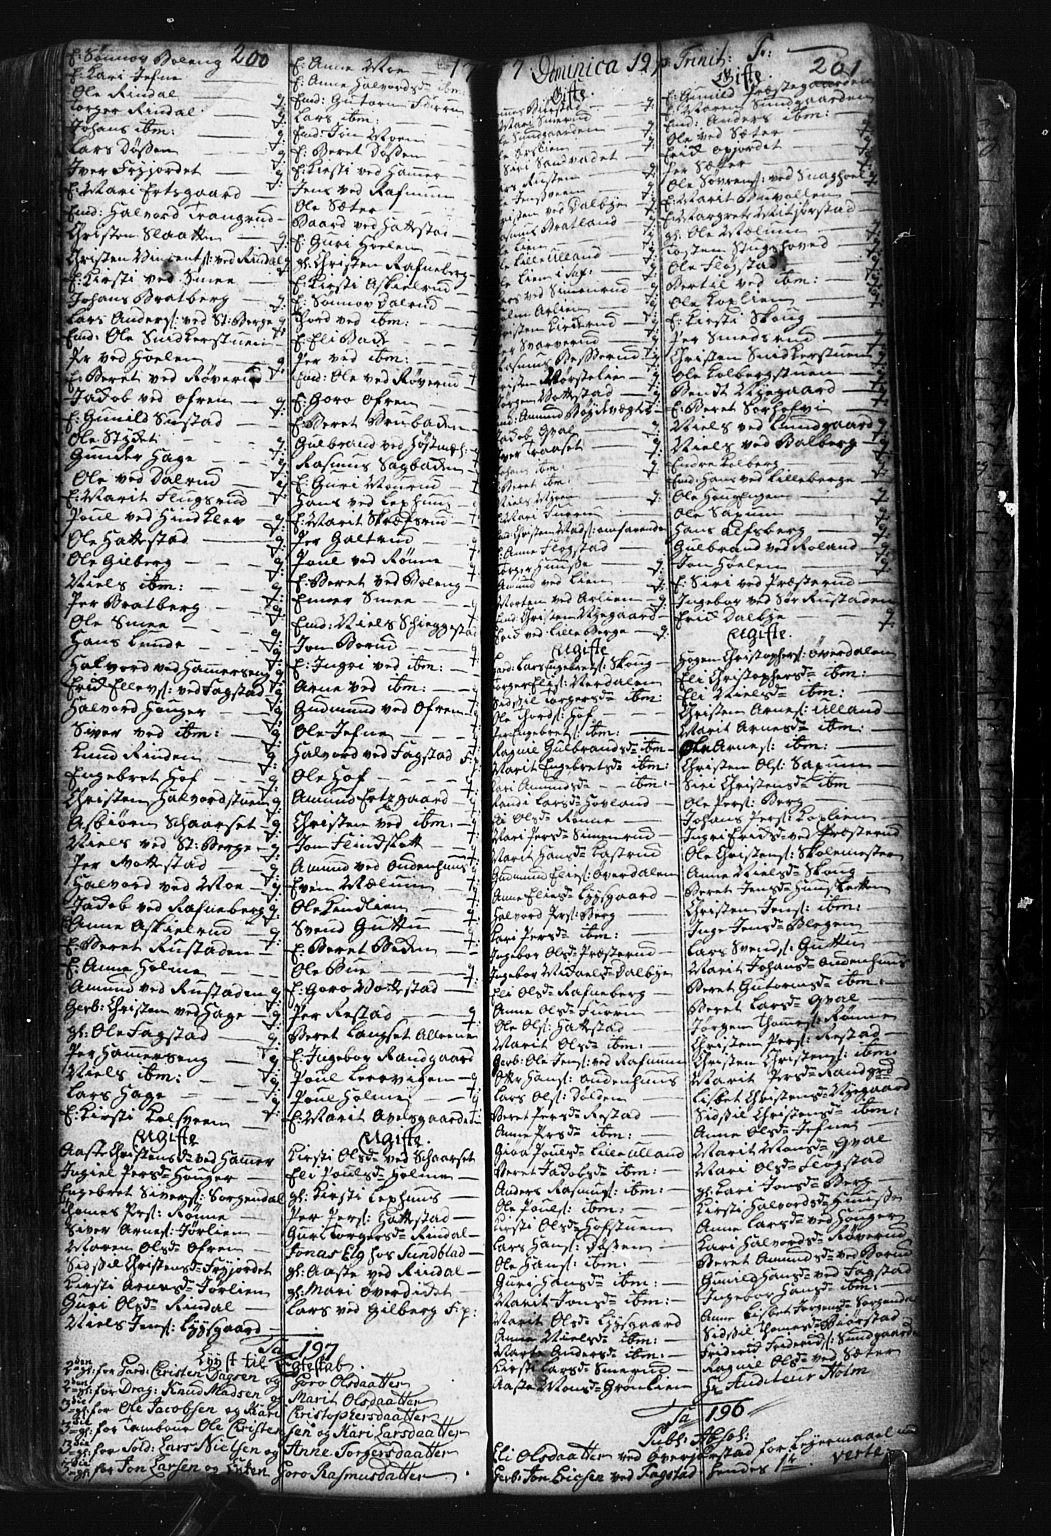 SAH, Fåberg prestekontor, Klokkerbok nr. 1, 1727-1767, s. 200-201